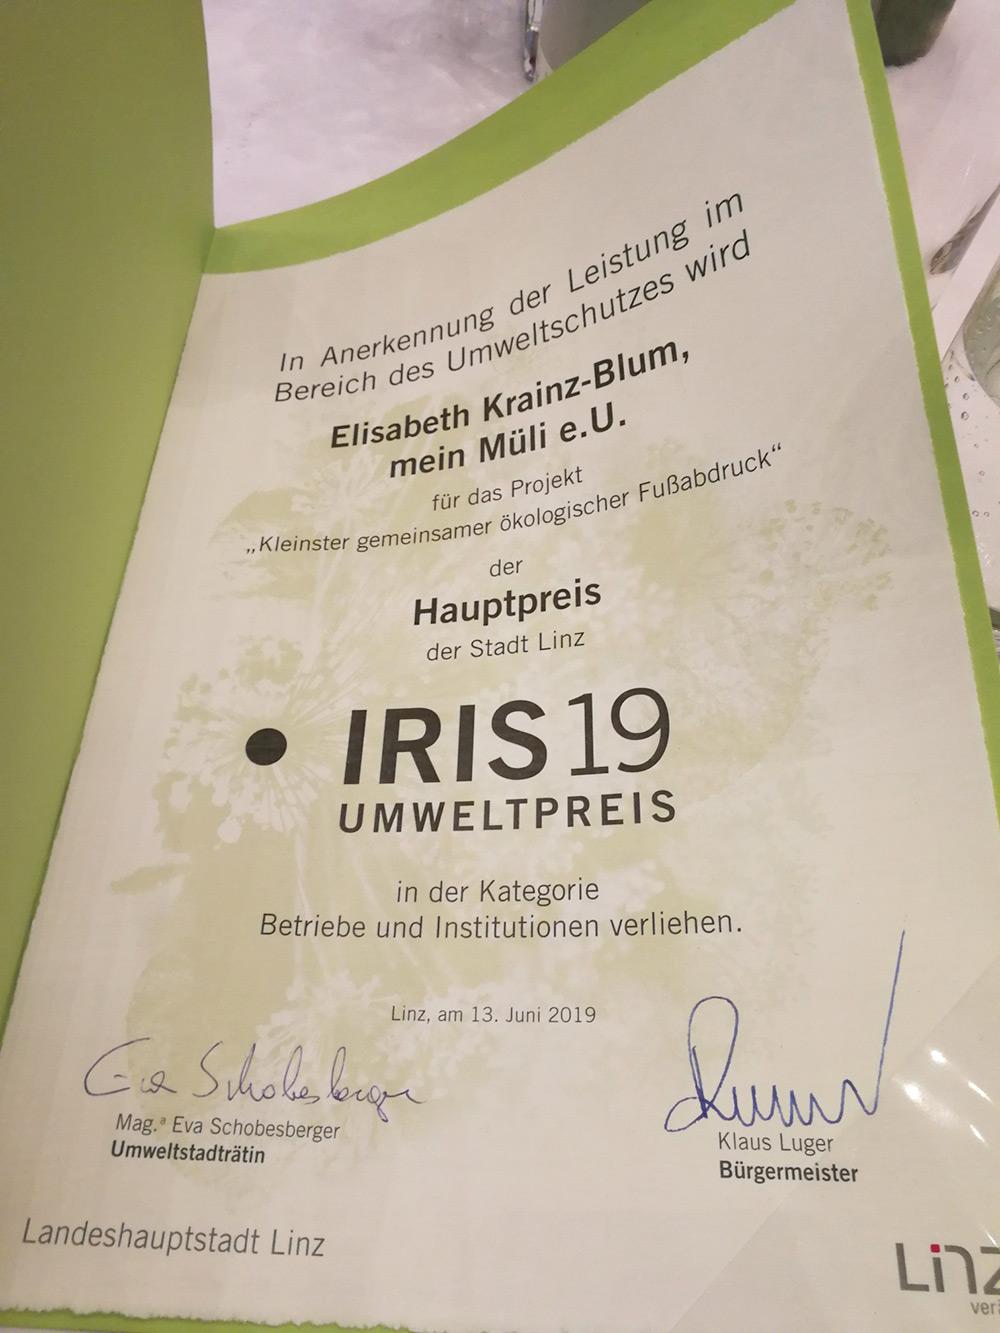 iris19_urkunde